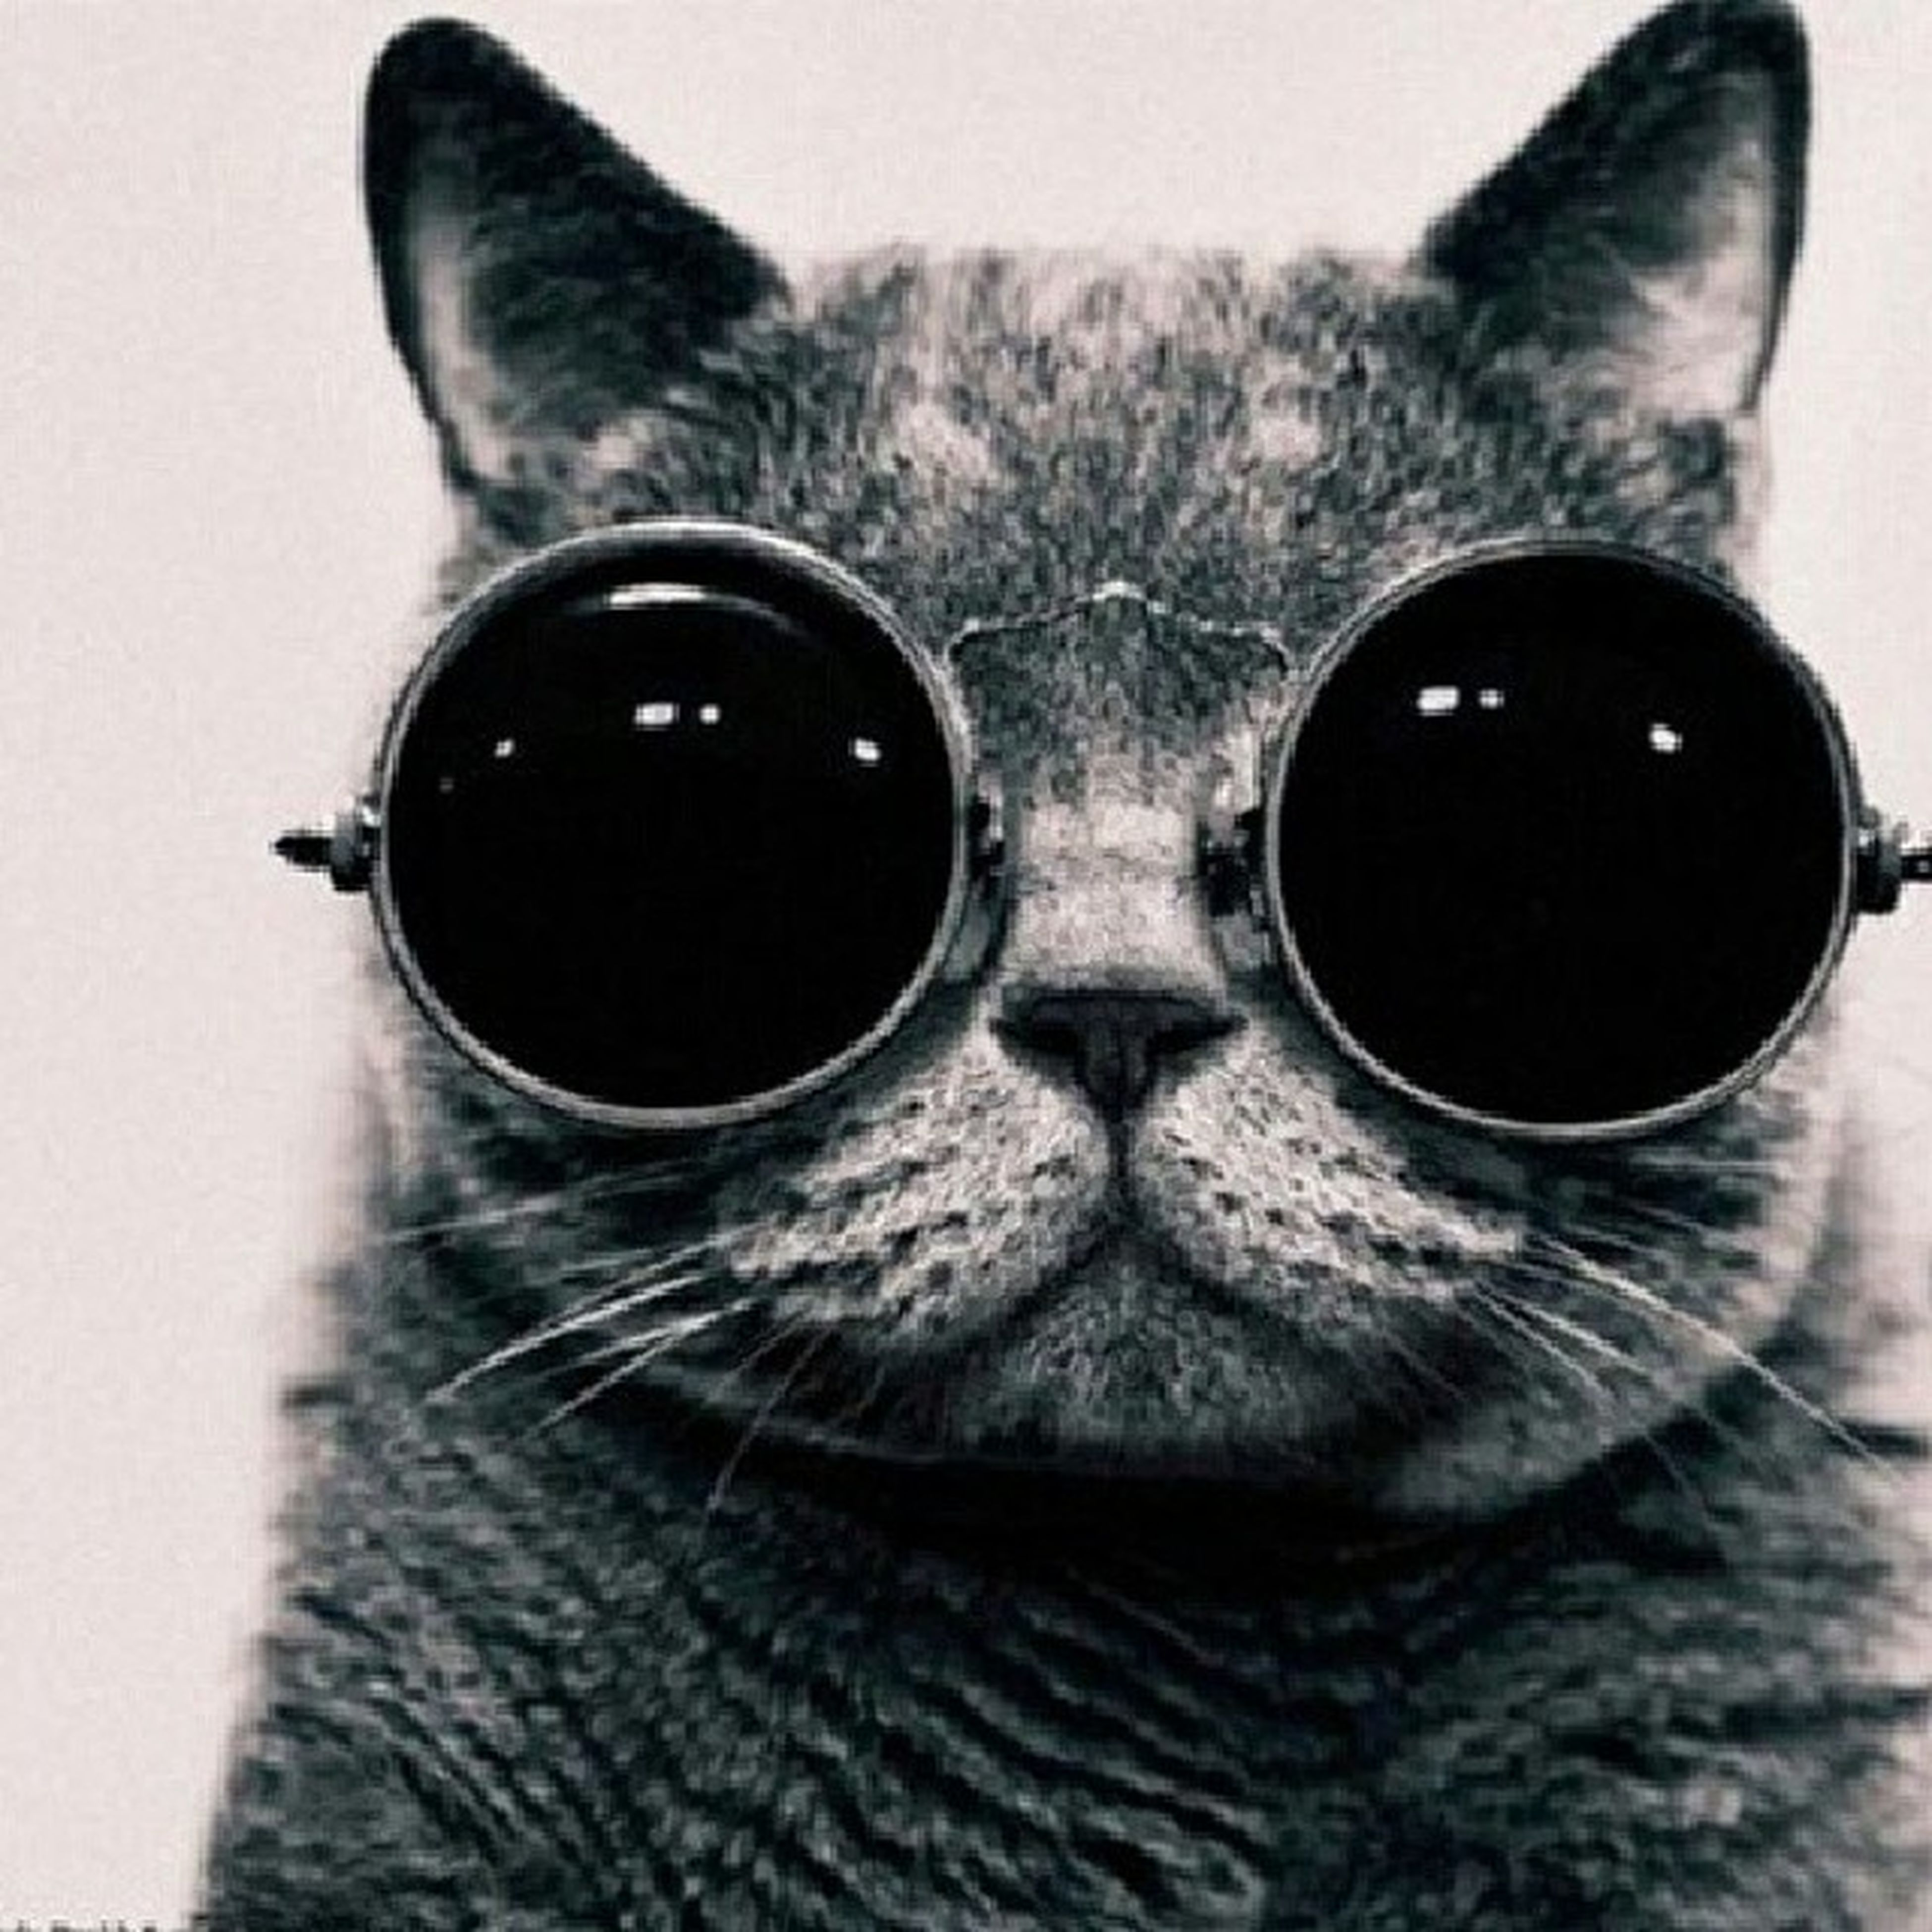 Cat Glasses Hecks Yay